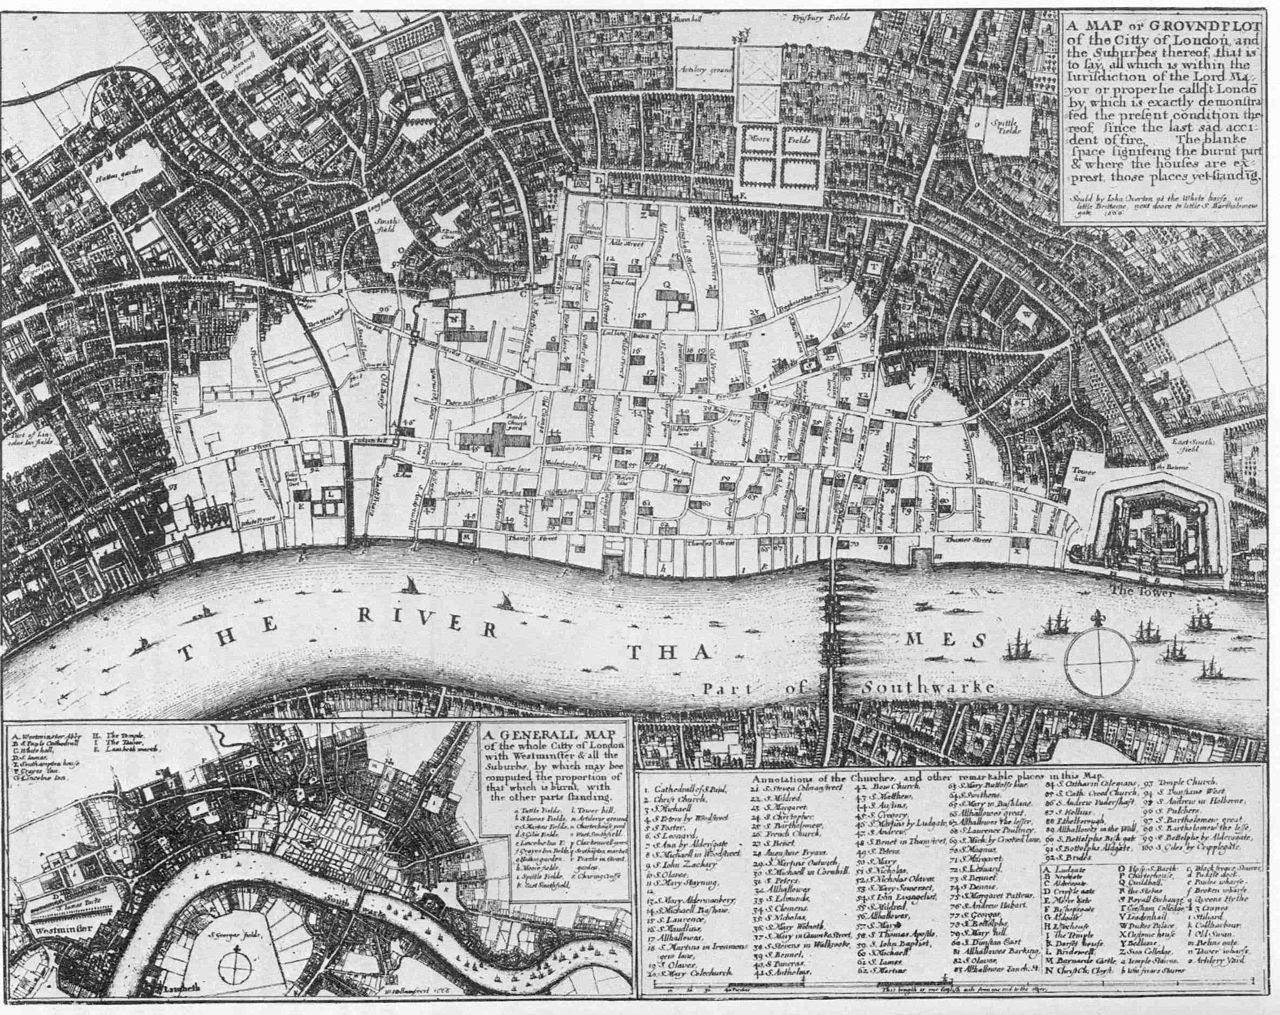 FileMapLondonguttedjpg Wikimedia Commons - Buy ancient maps